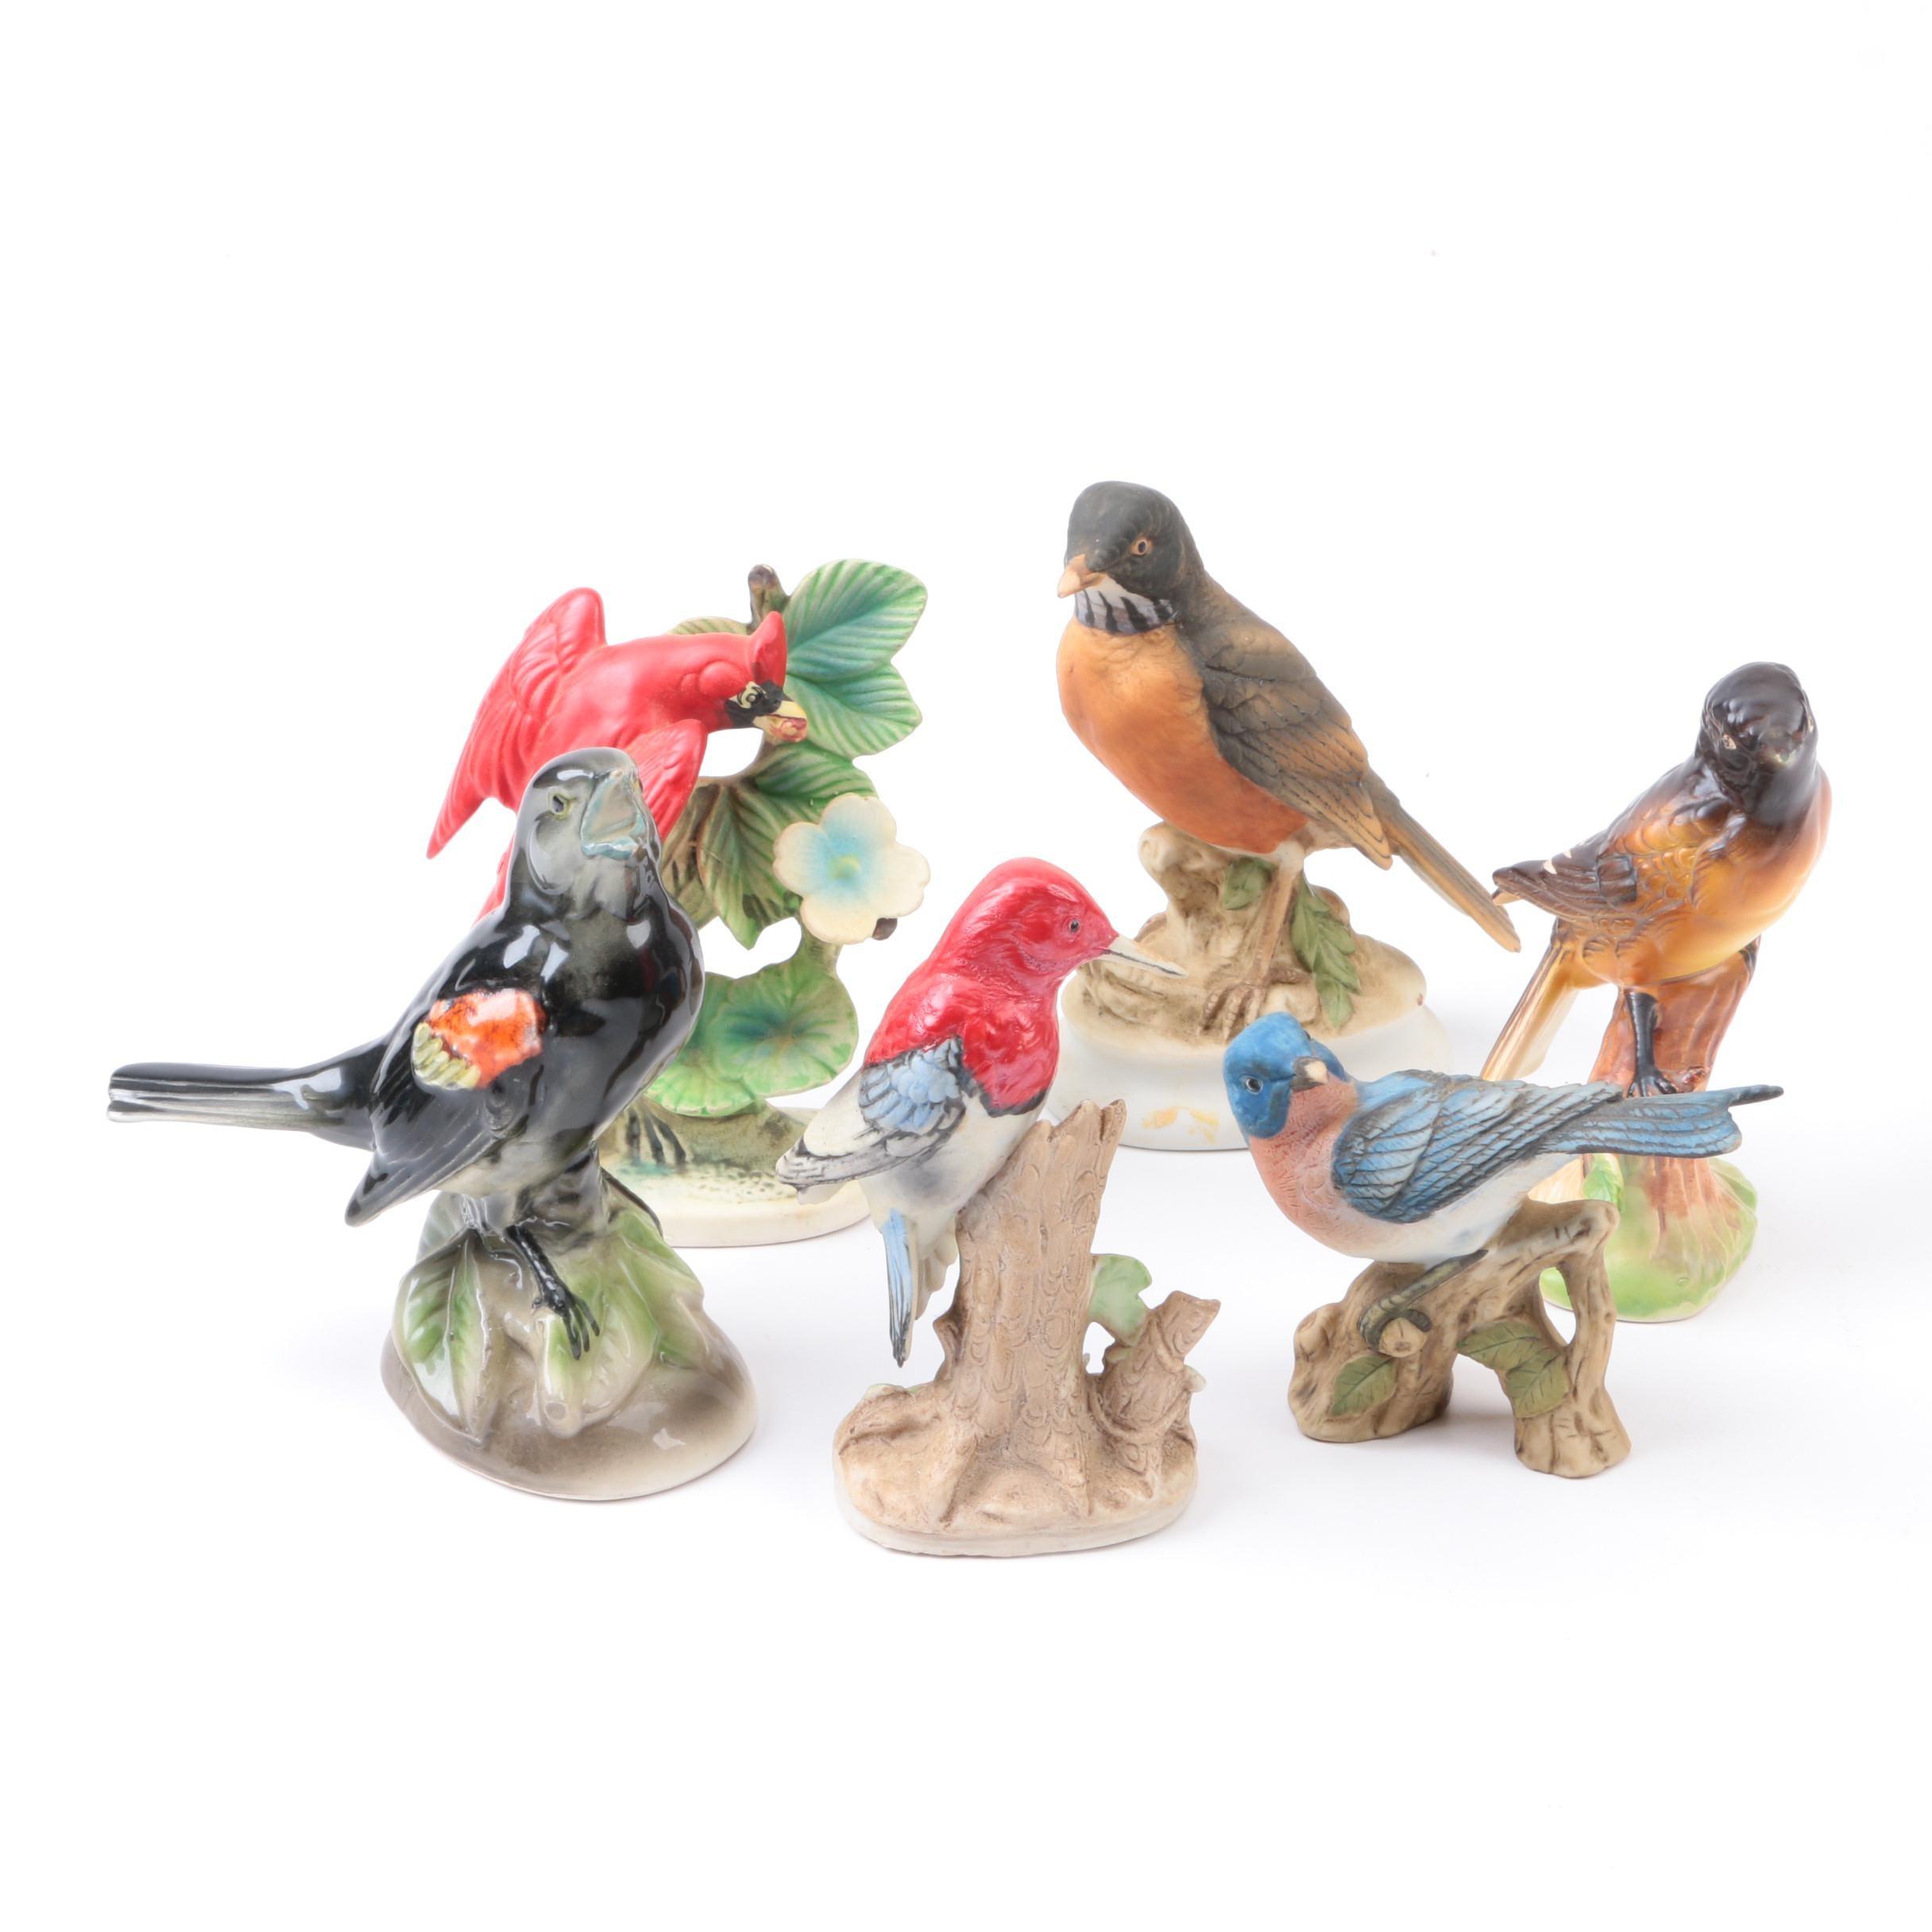 Vintage Porcelain And Ceramic Bird Figurines Including